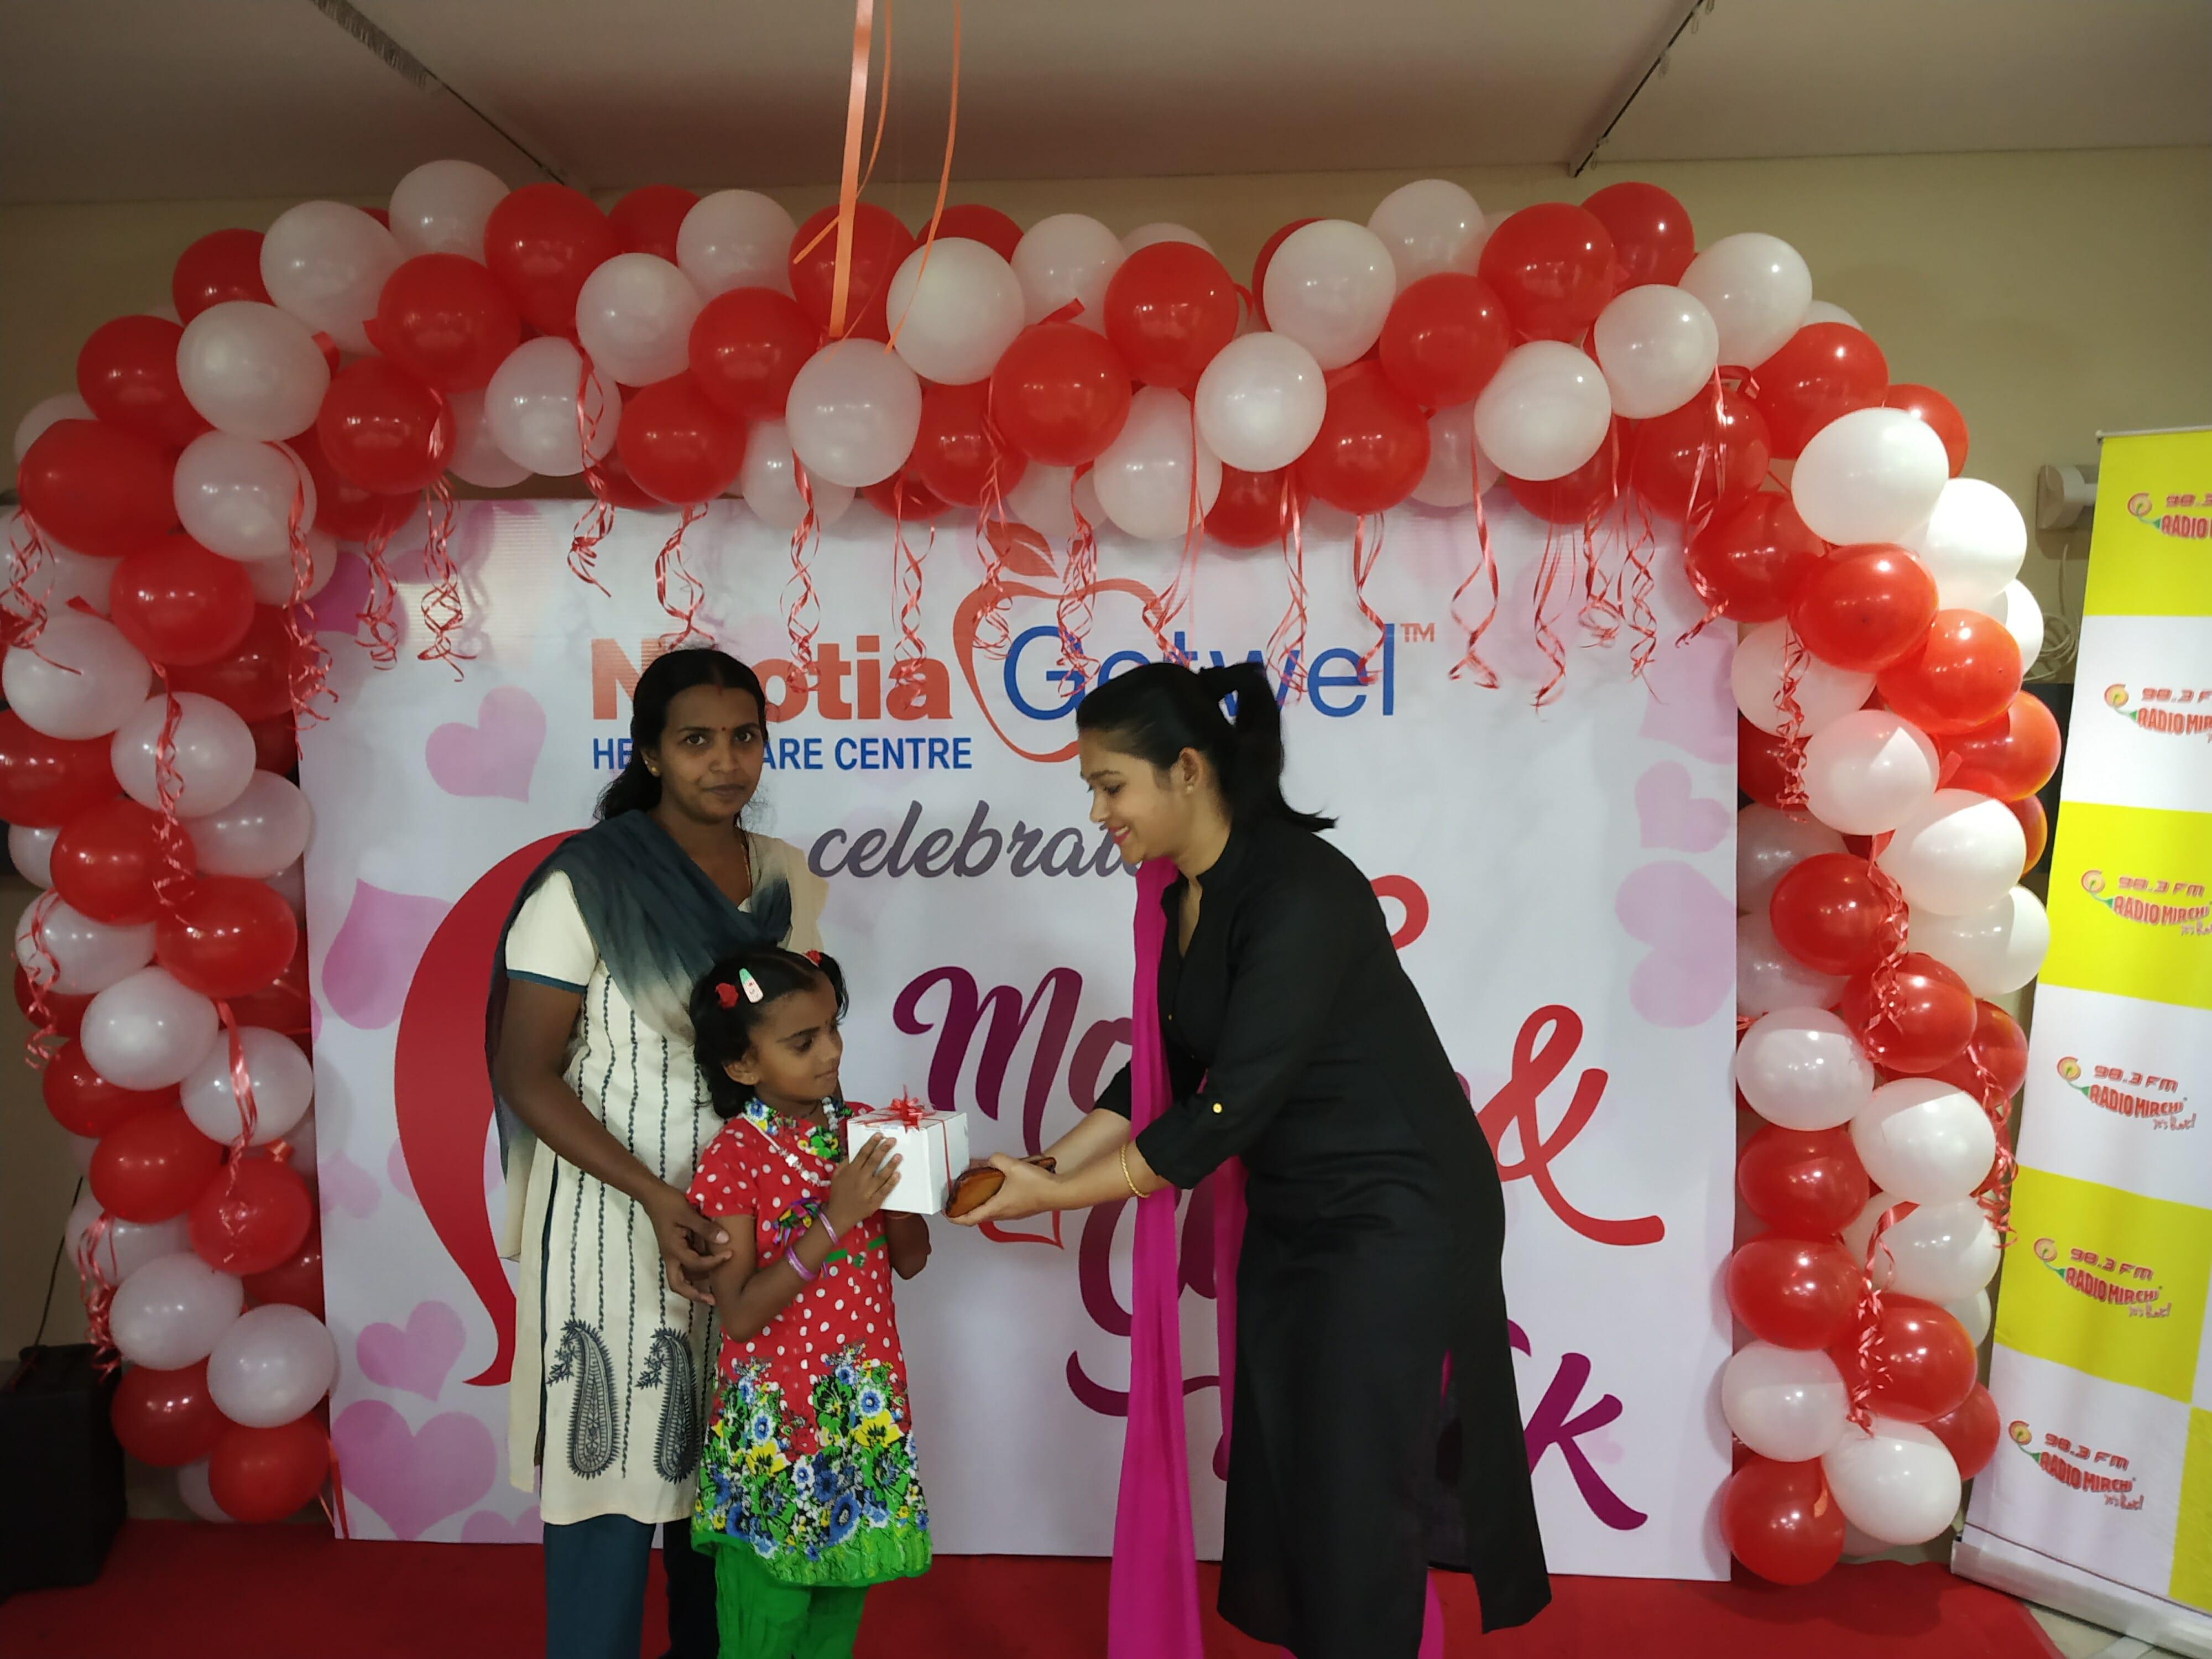 Neotia Getwel Event